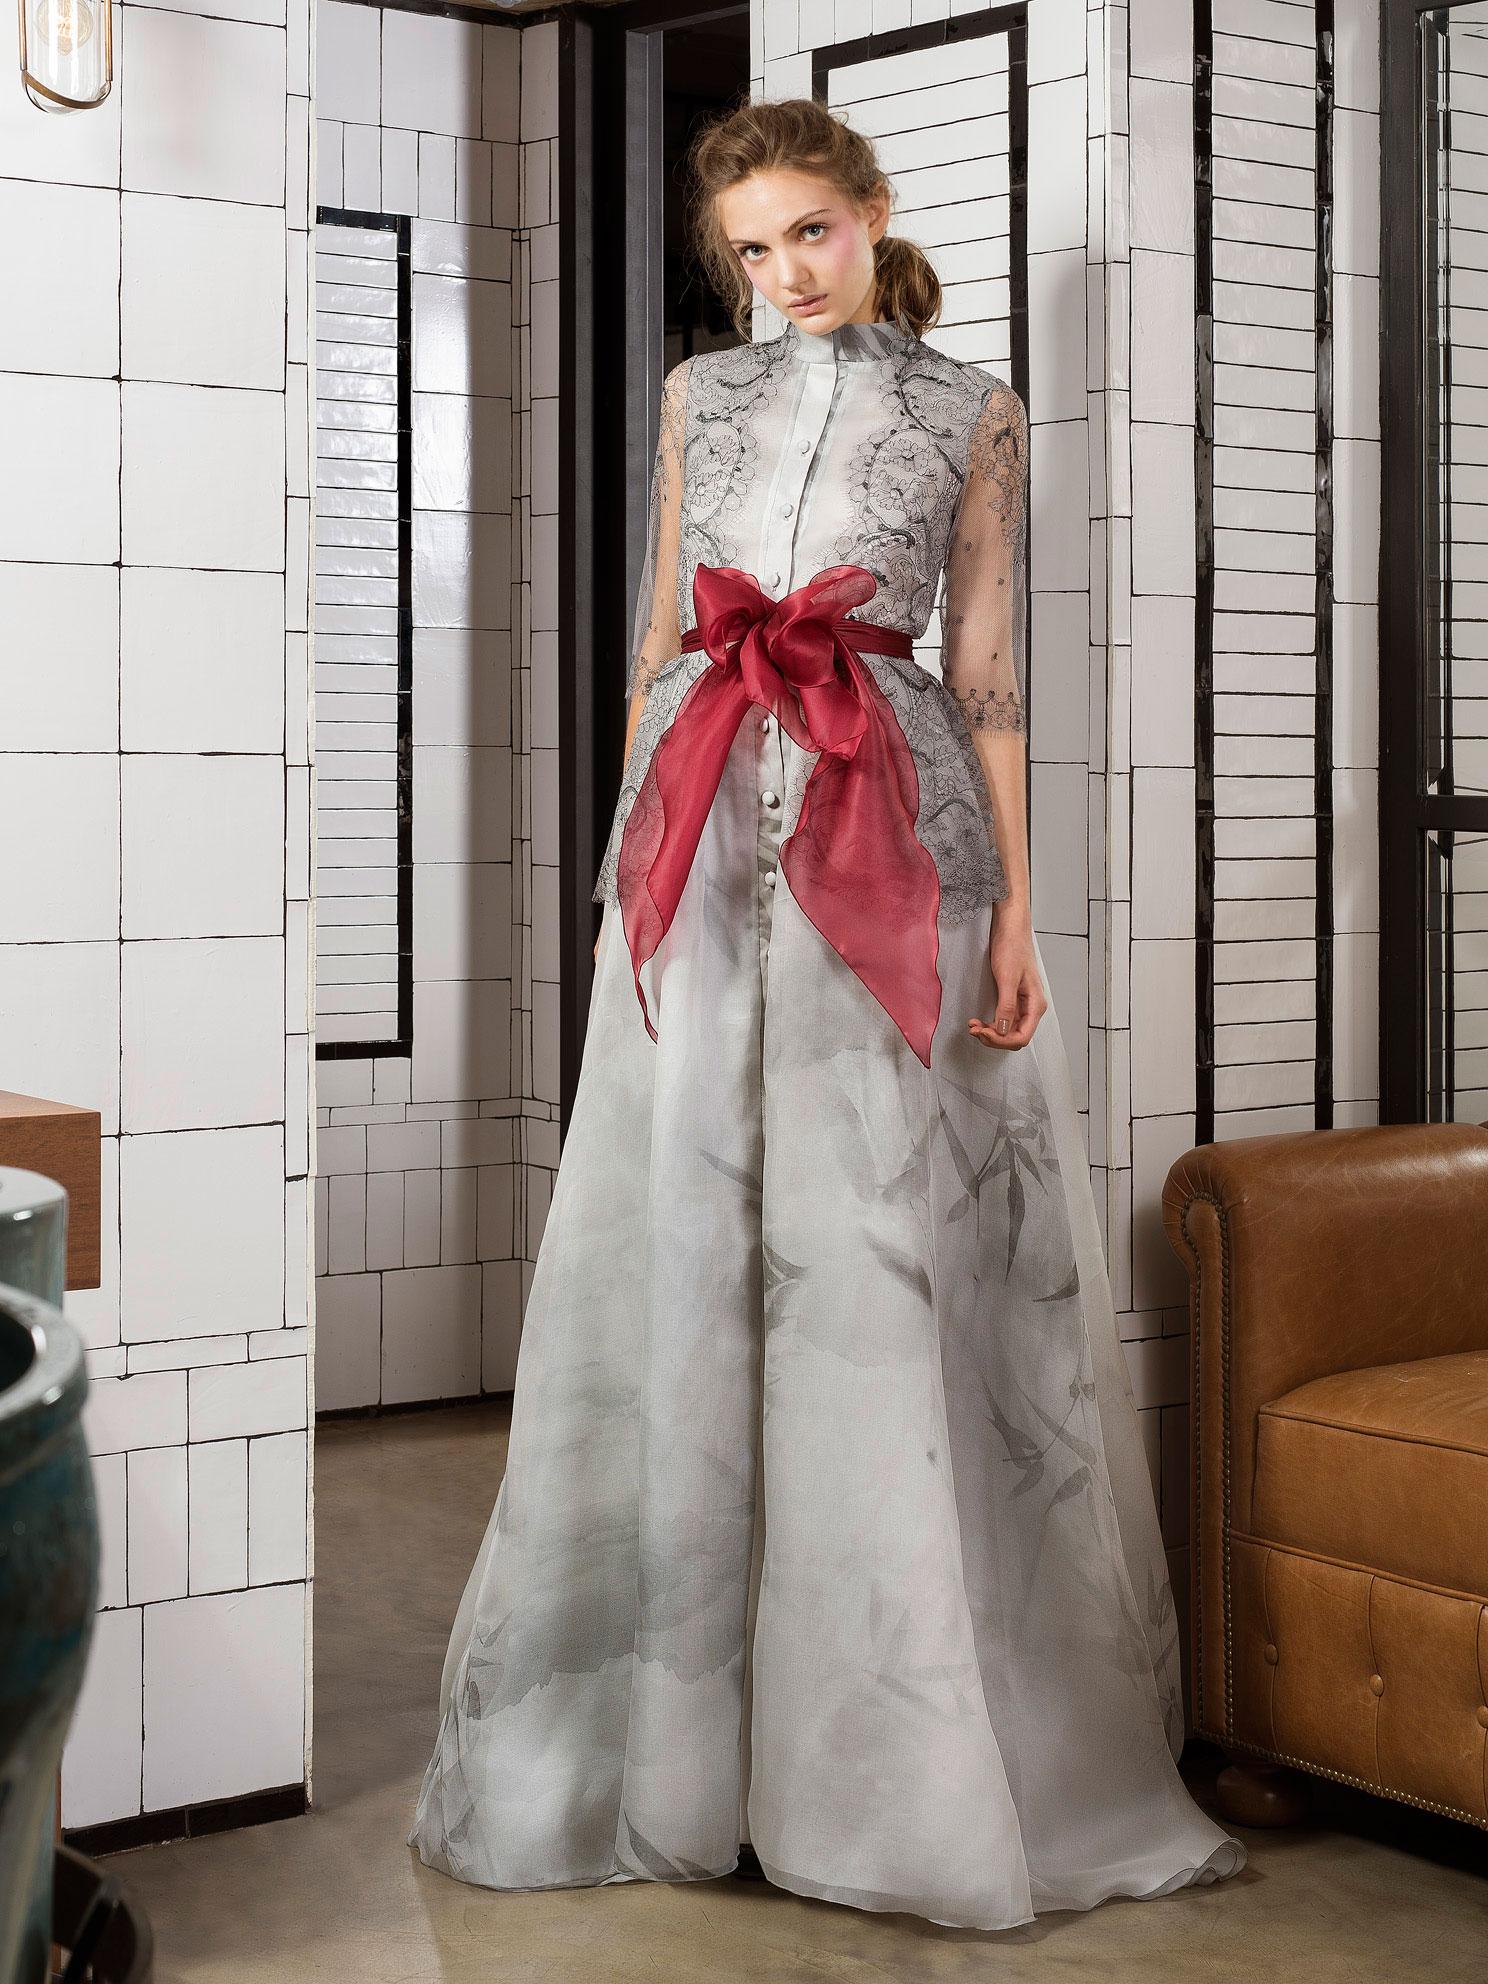 inmaculada-garcia-barcelona-vestidos-fiesta-bercia-01